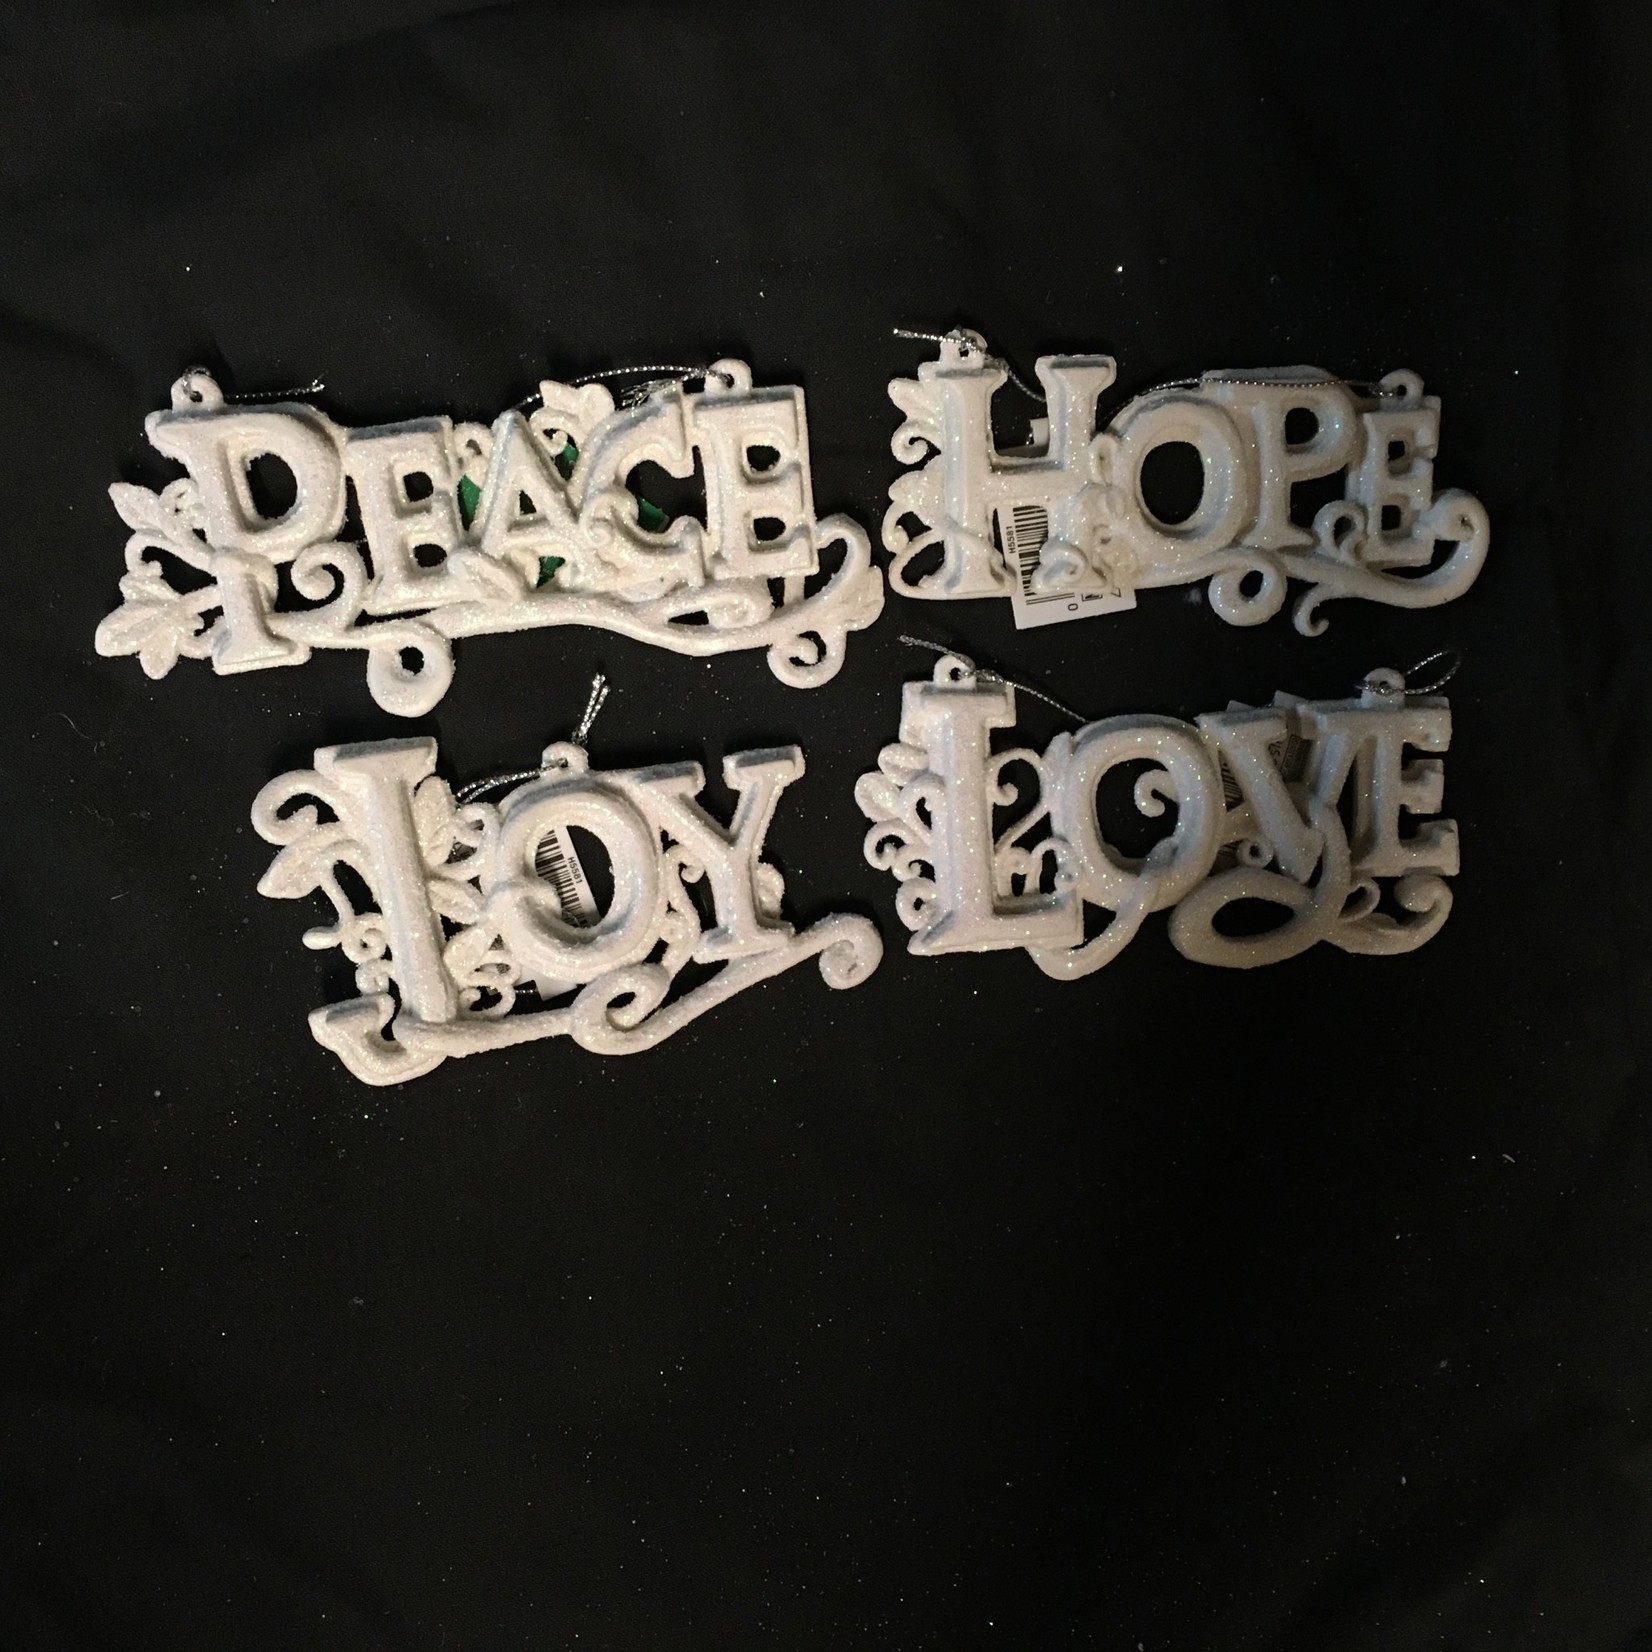 Glitter Love/Hope/Joy/Peace Orn 4A